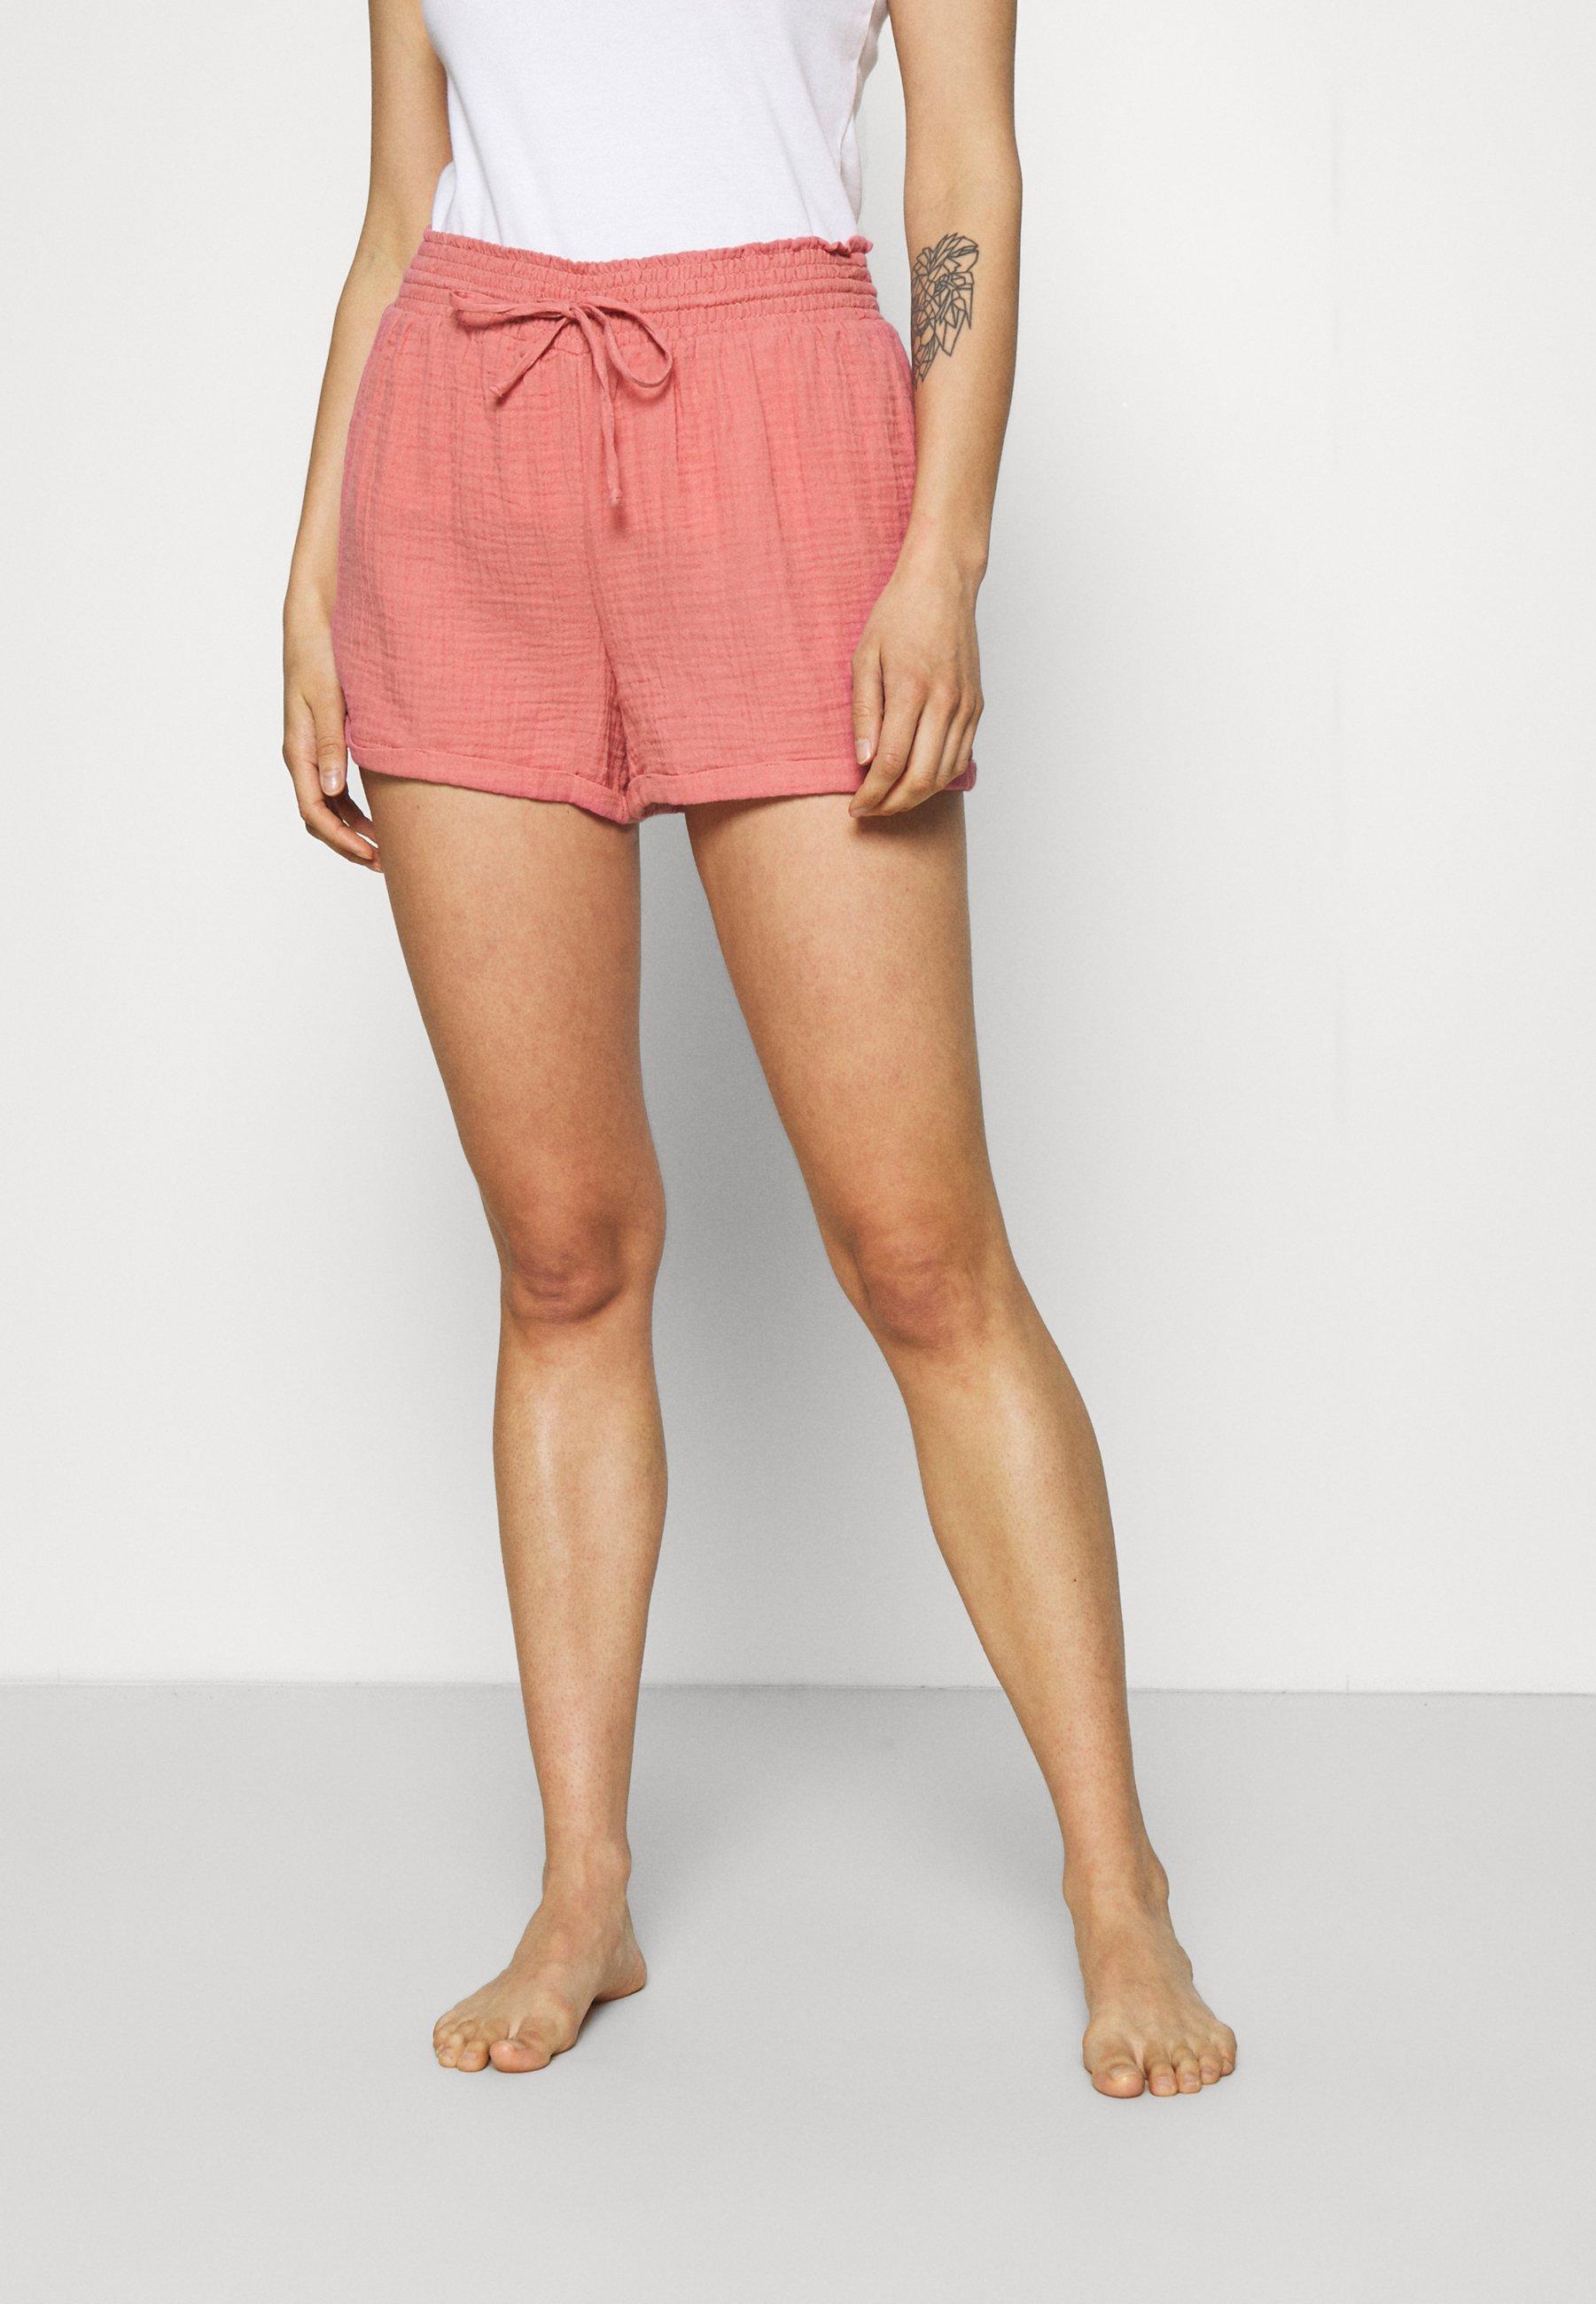 Donna SHORTS - Pantaloni del pigiama